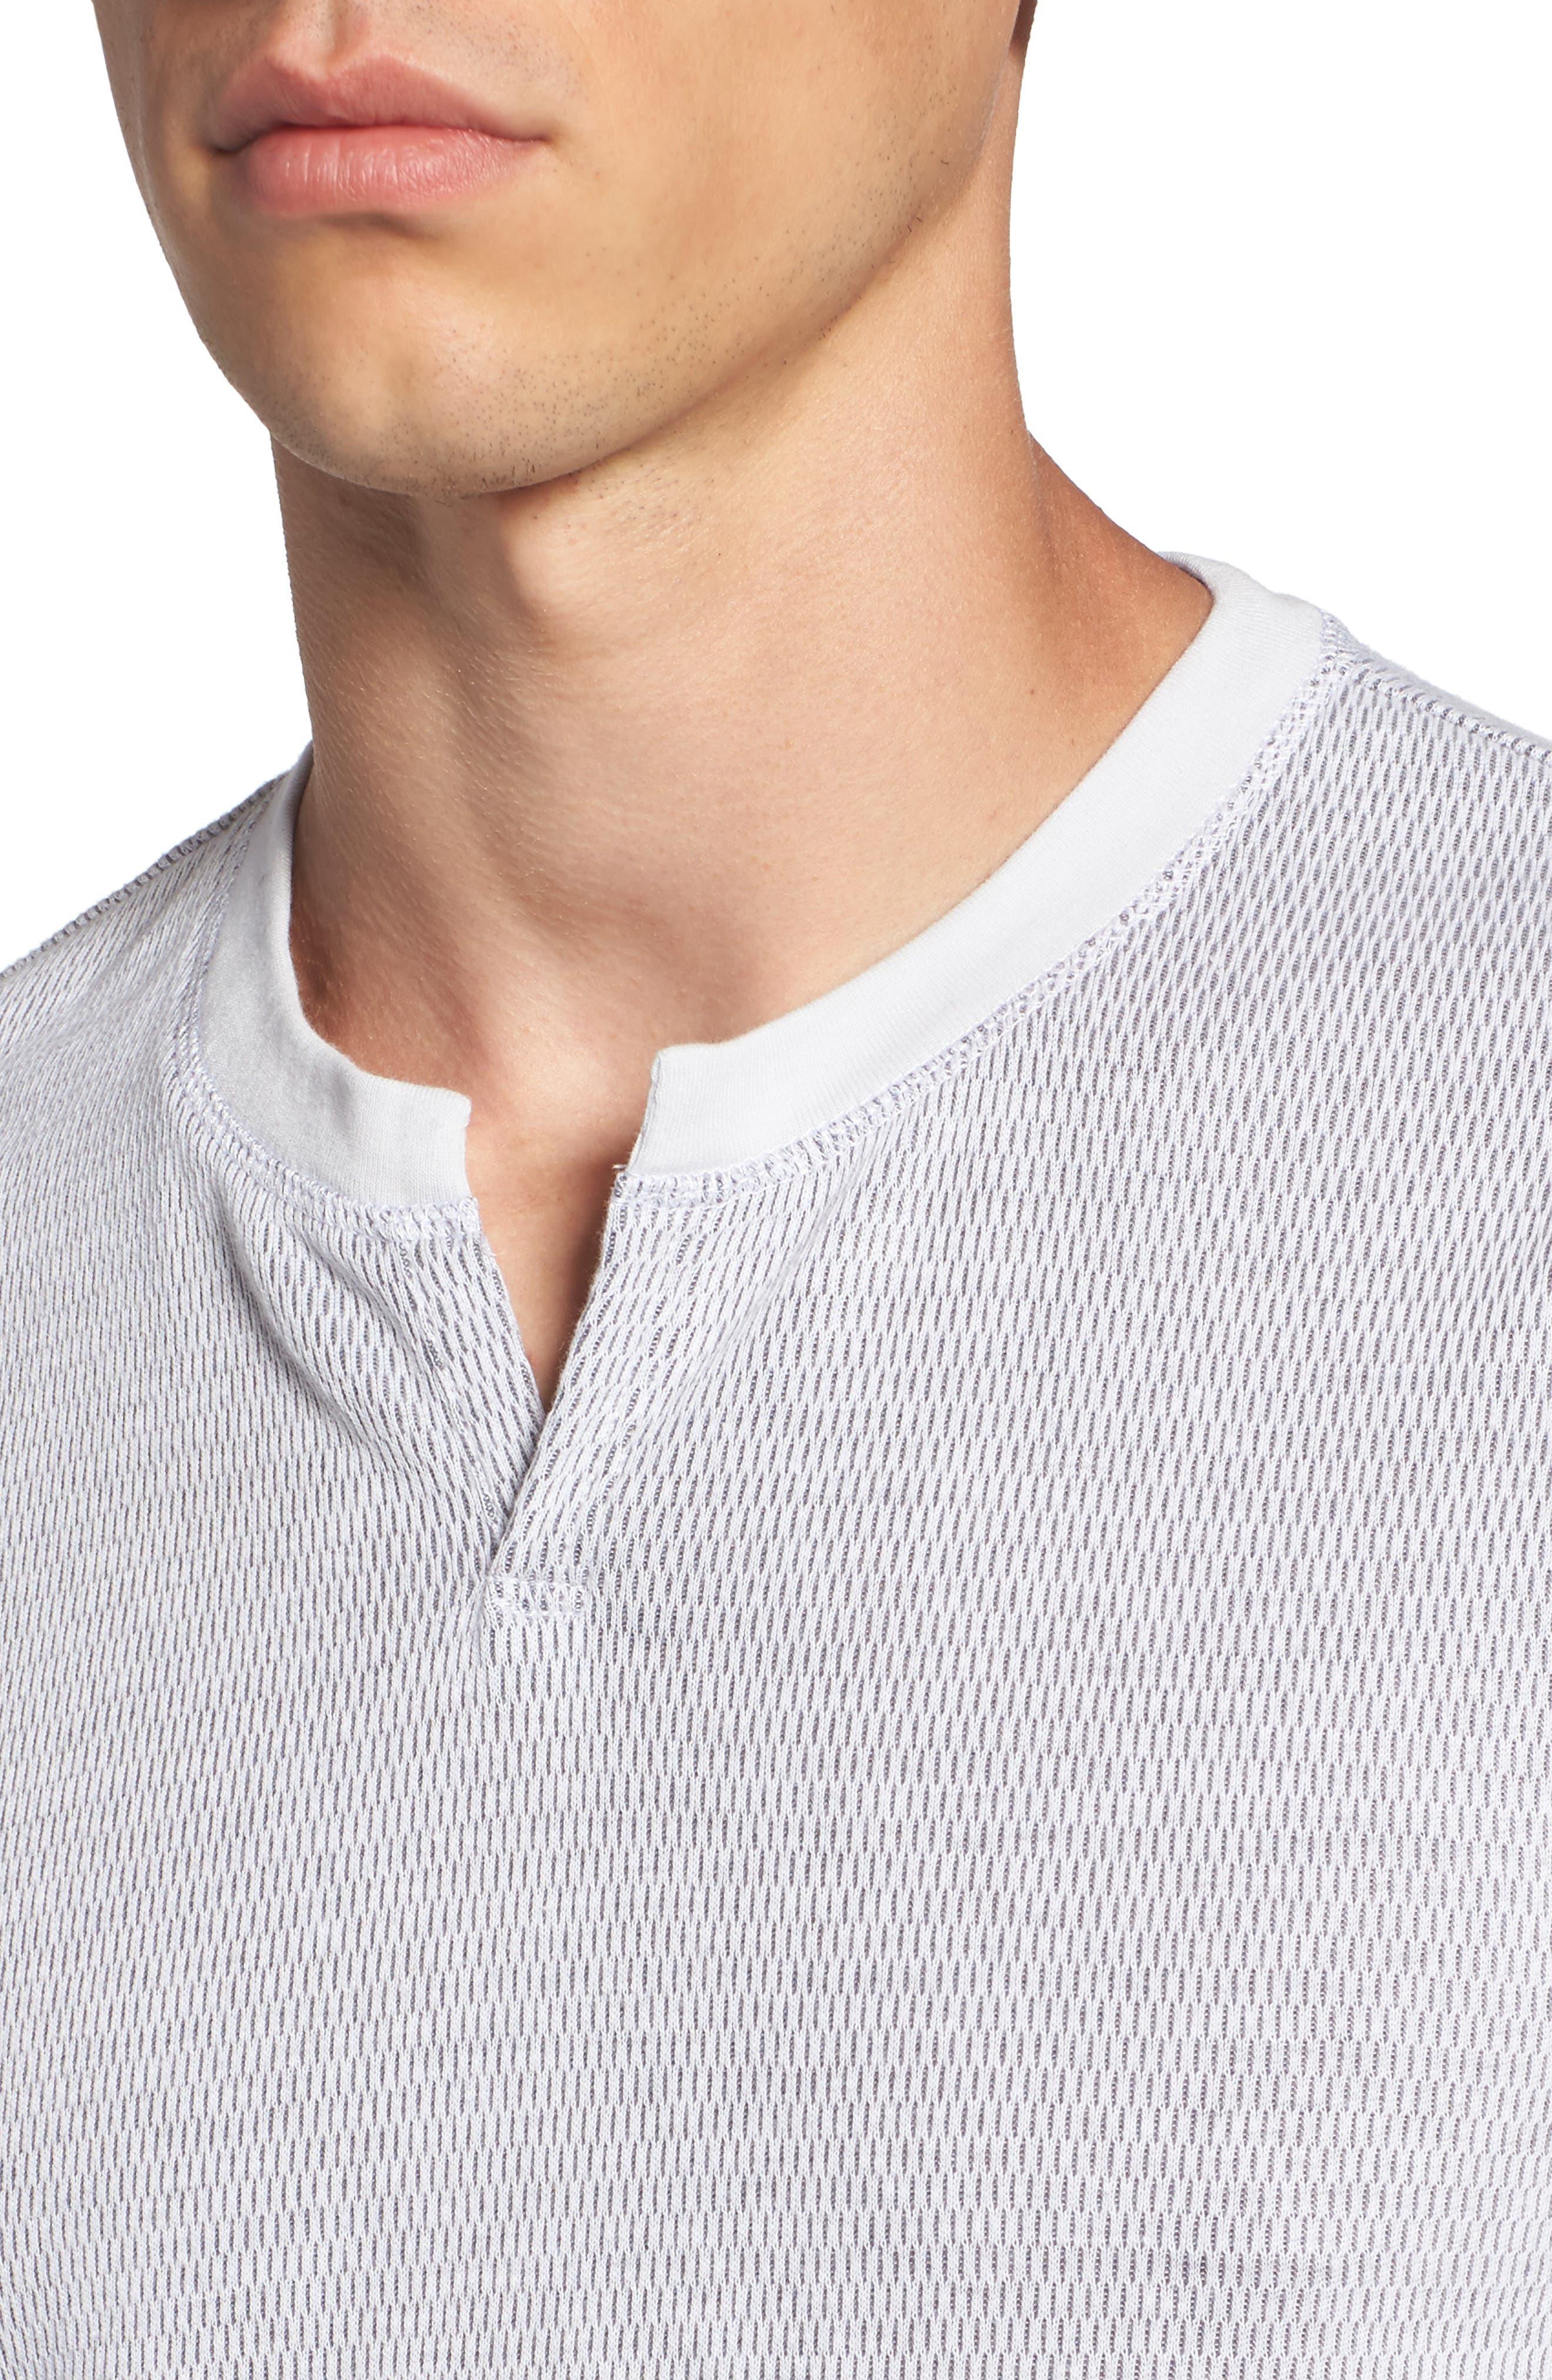 Notch Neck Thermal T-Shirt,                             Alternate thumbnail 24, color,